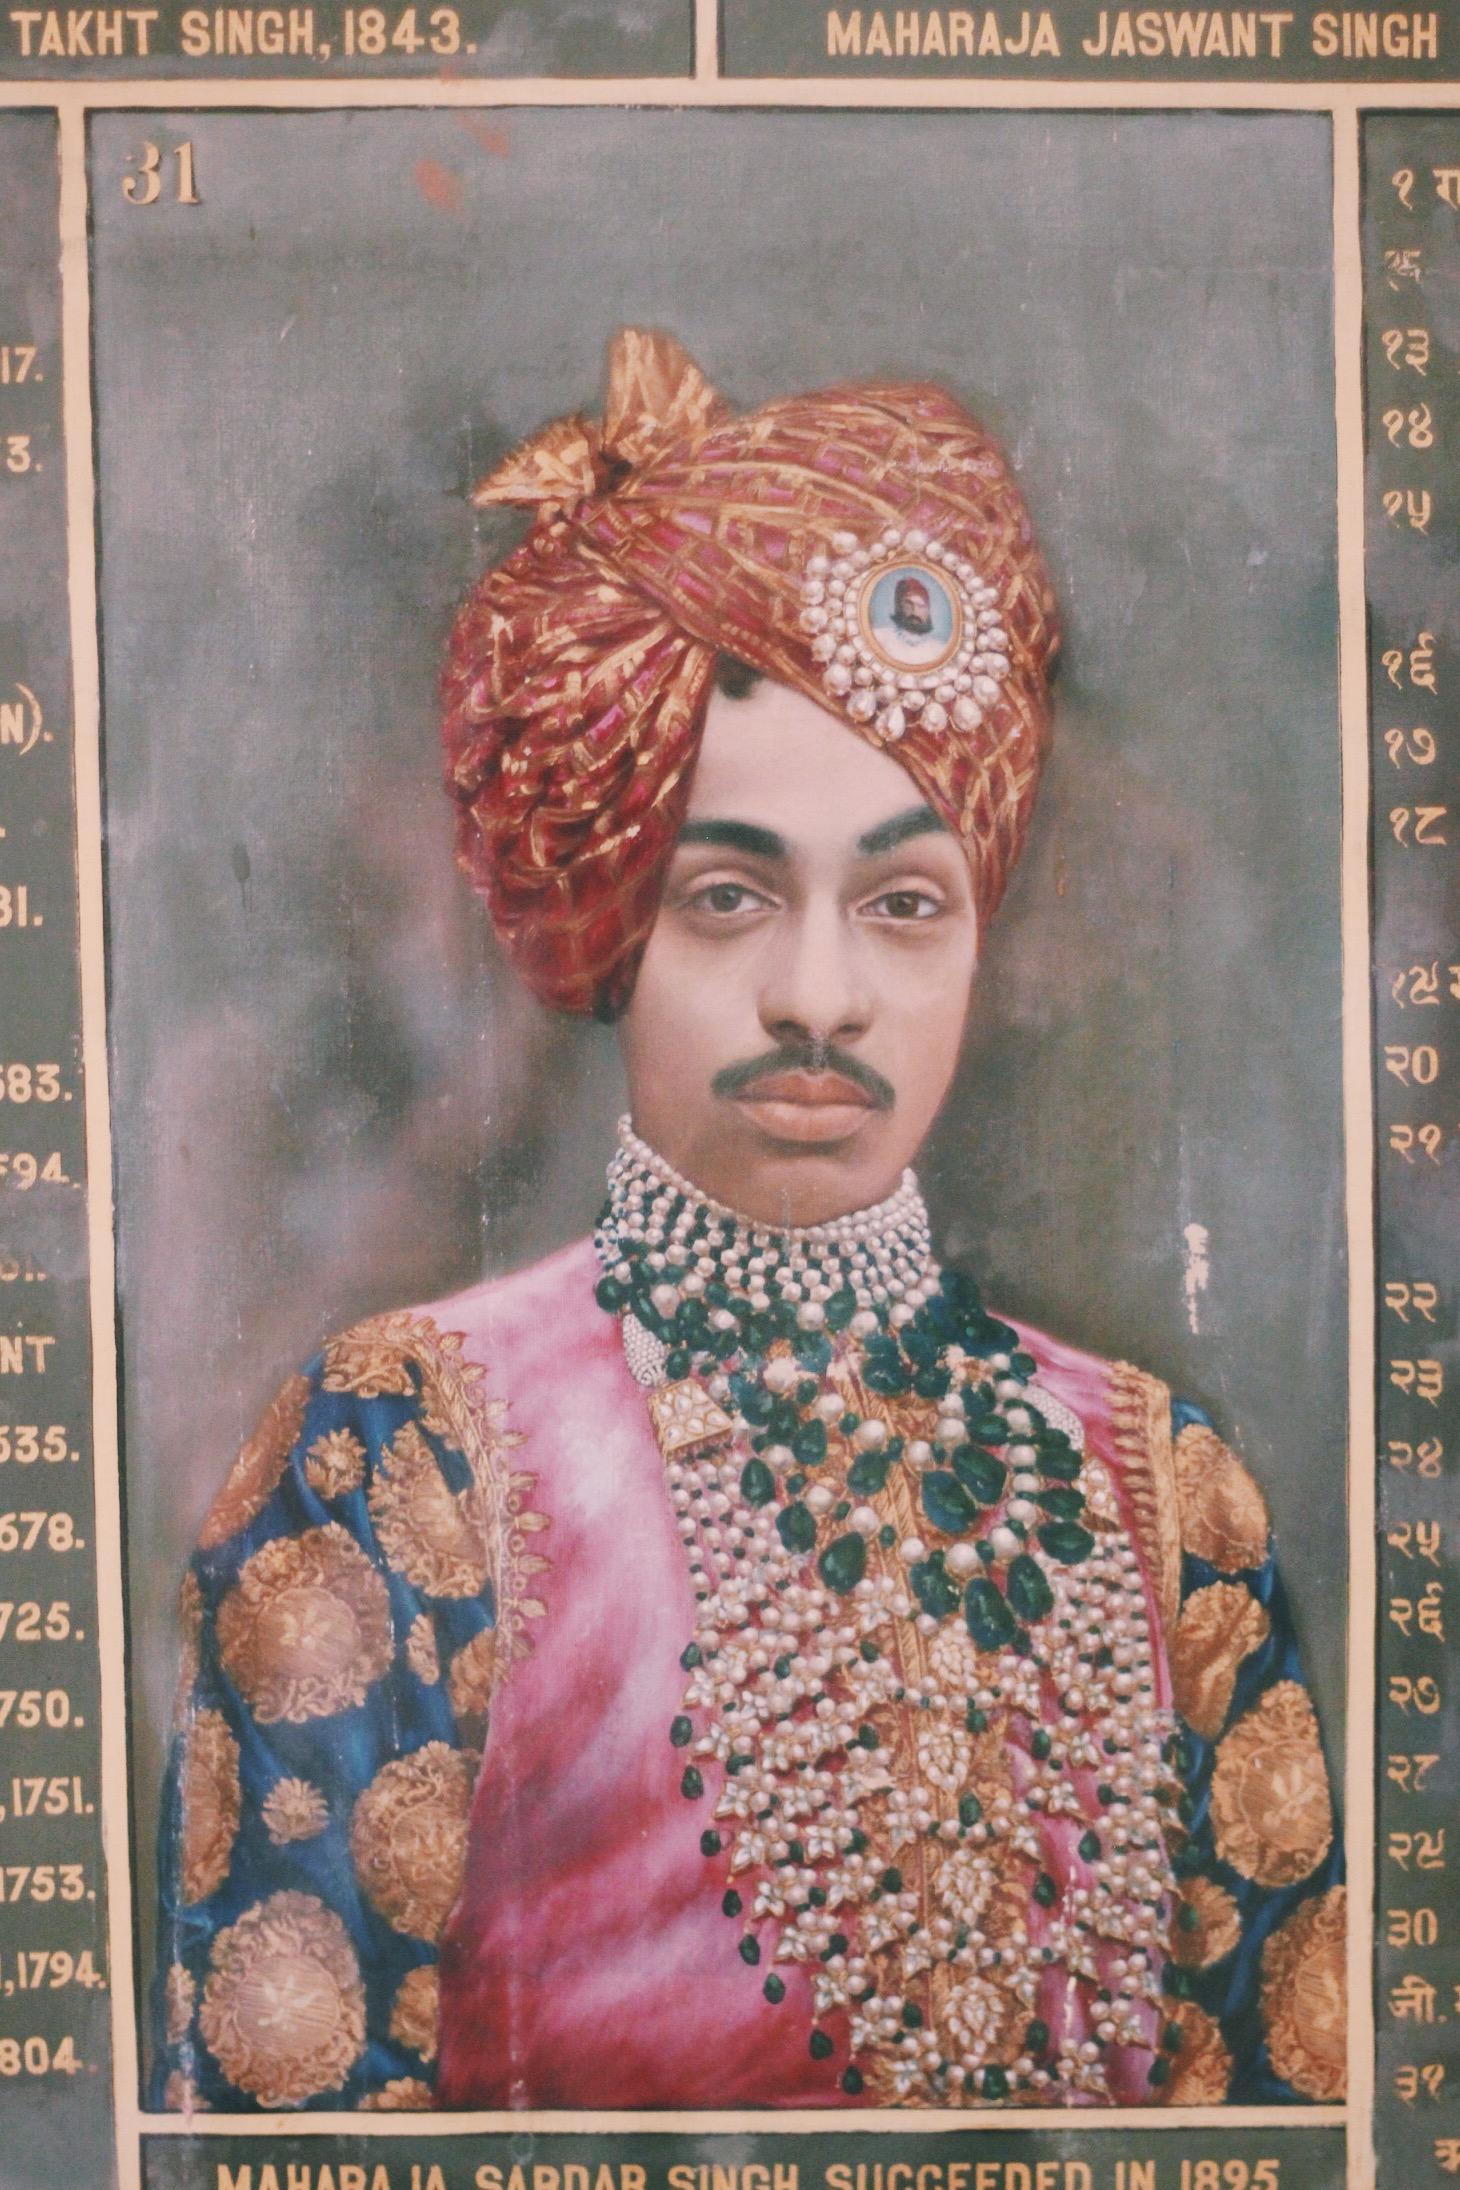 Portrait at the Mehrangarh Fort, Jodhpur